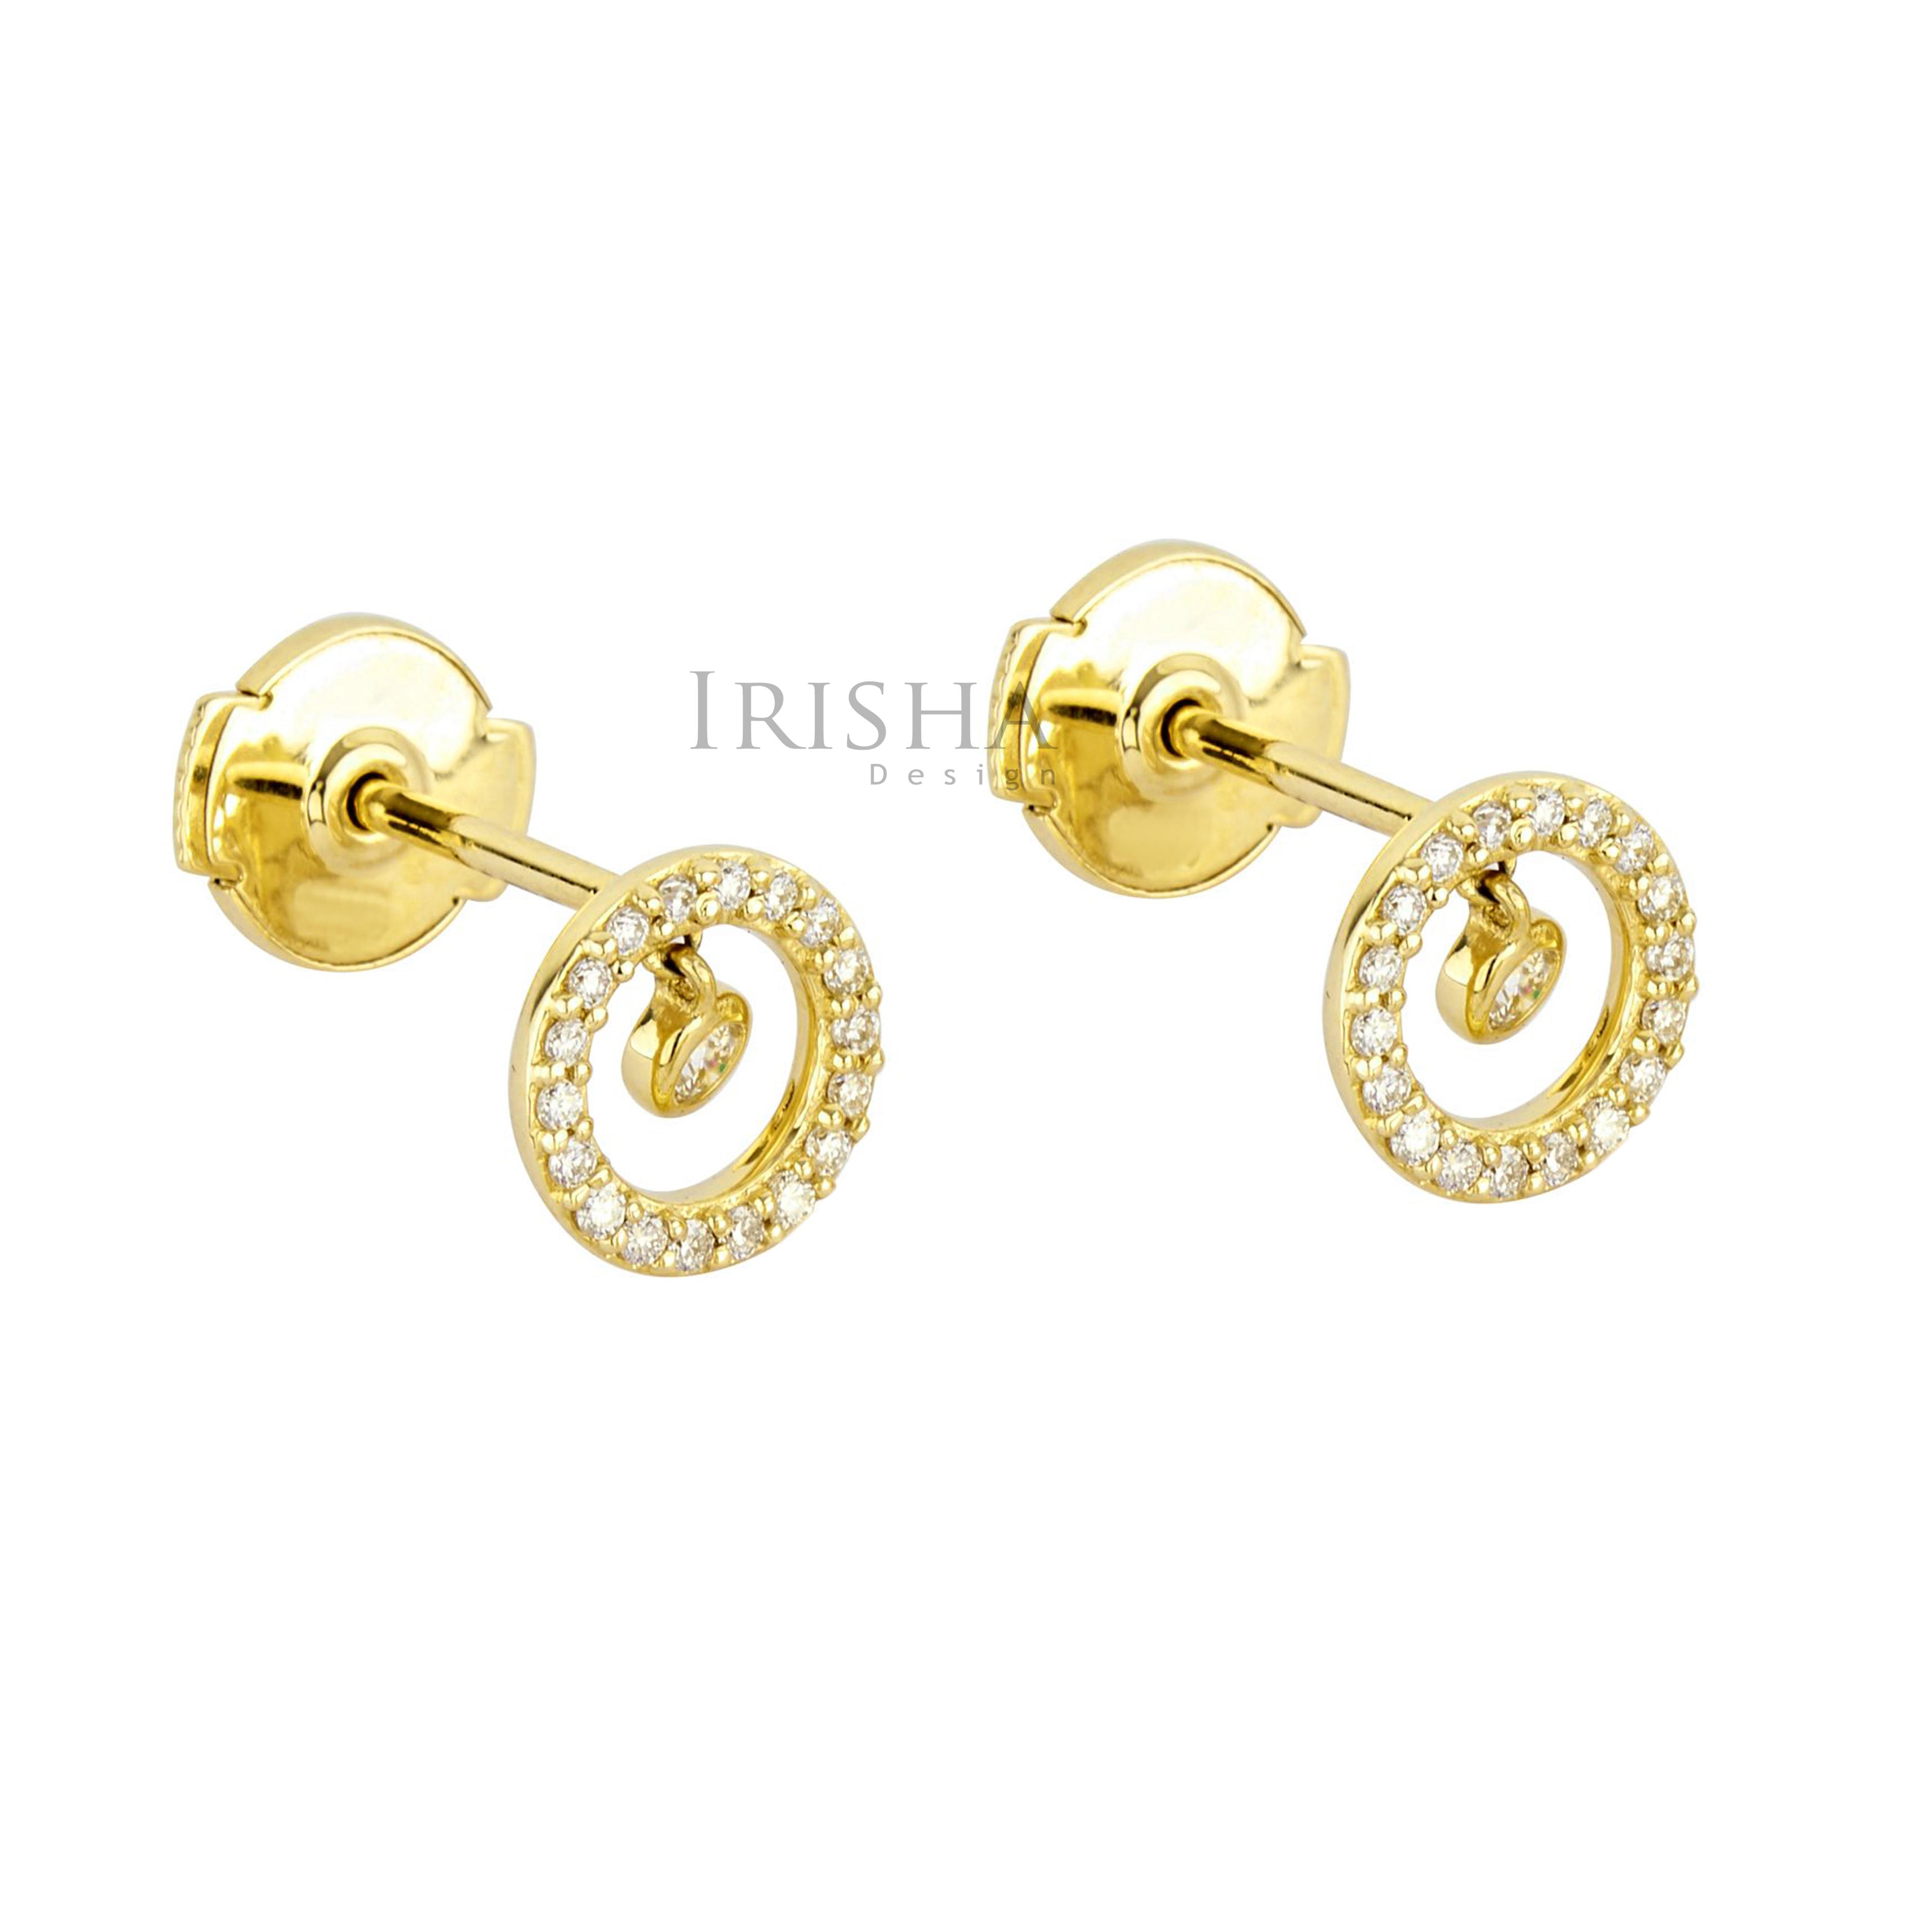 14K Gold 0.33 Ct. Genuine Diamond Round Circle Studs Earrings Fine Jewelry